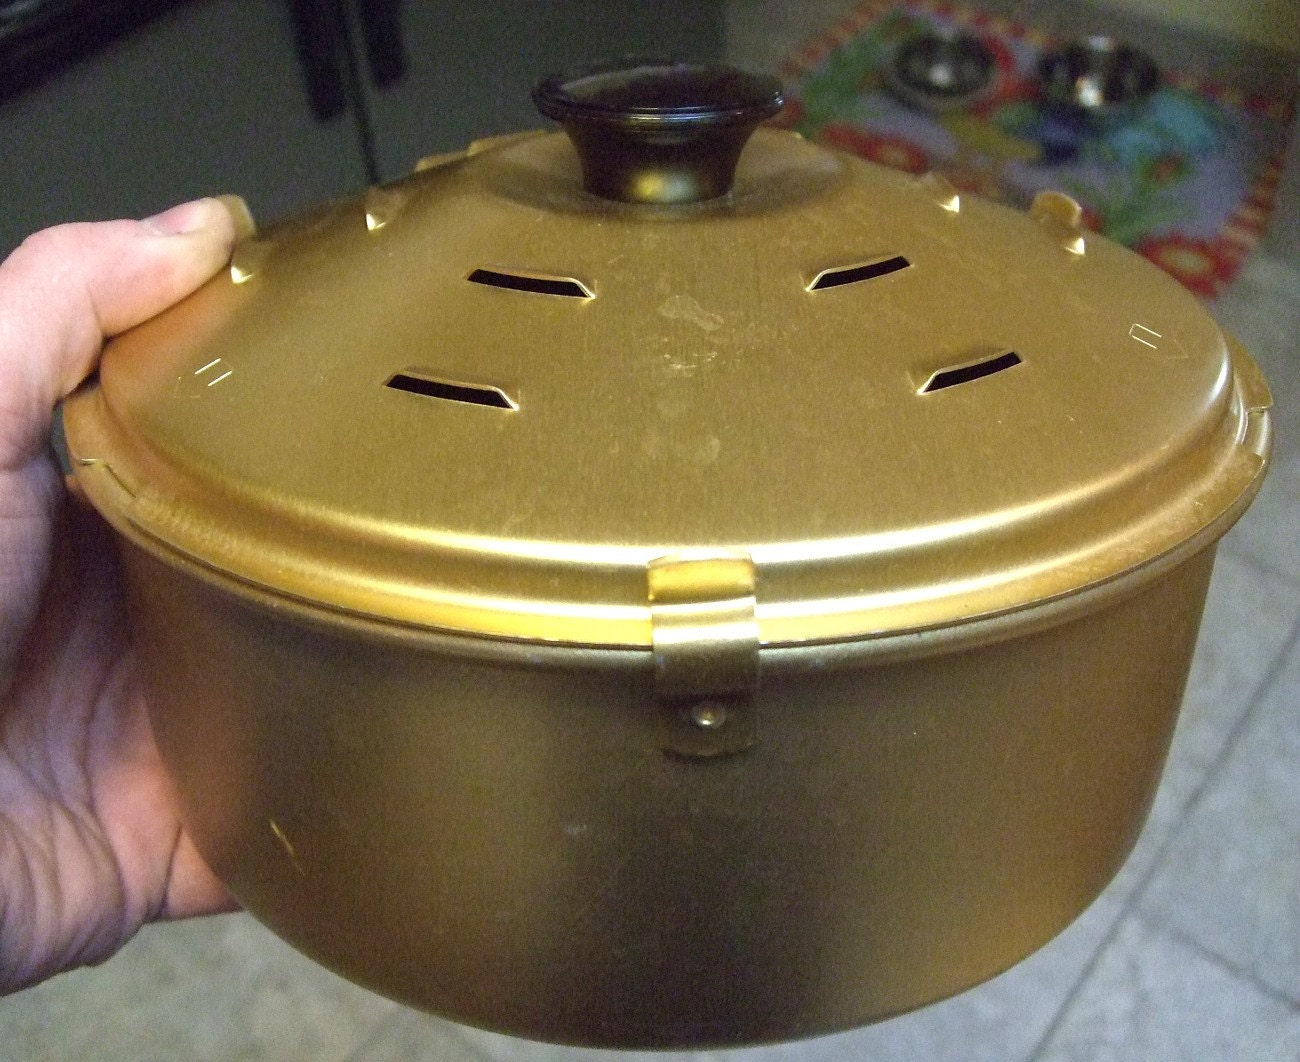 Vintage Rival Crock Pot Bread N Cake Bake Baking Pan For Slow